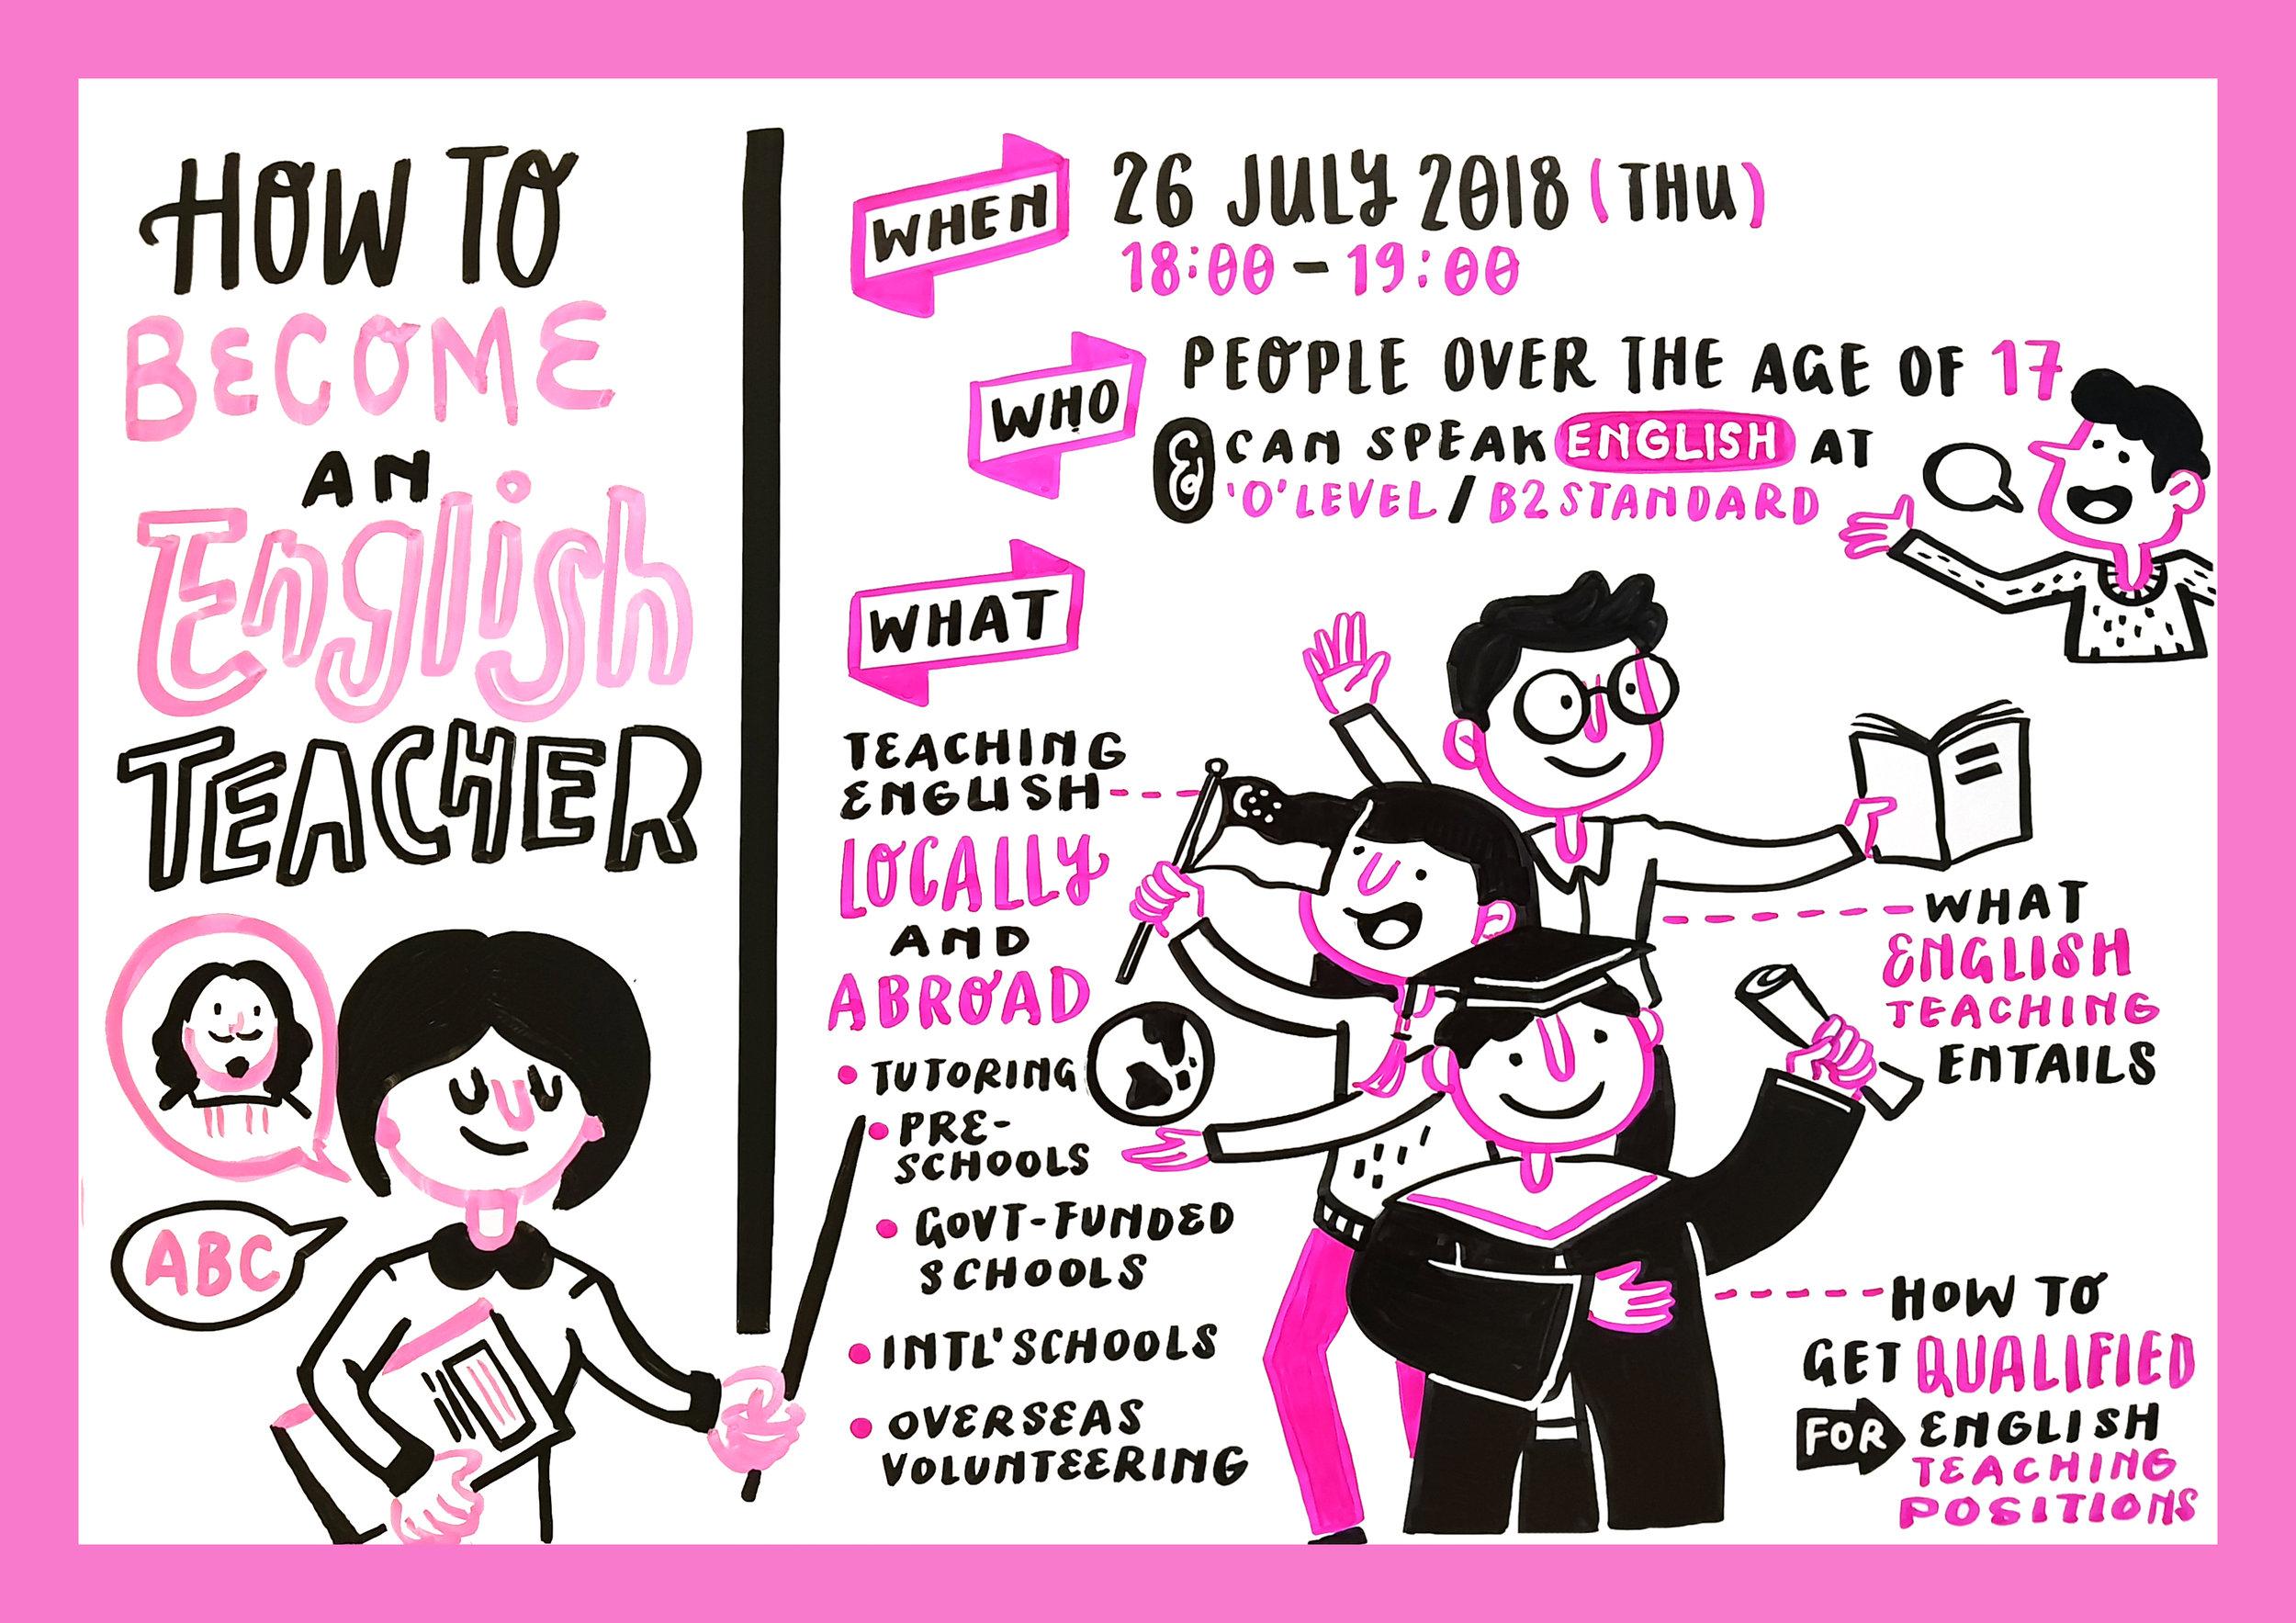 how_to_become_an_english_teacher.jpg